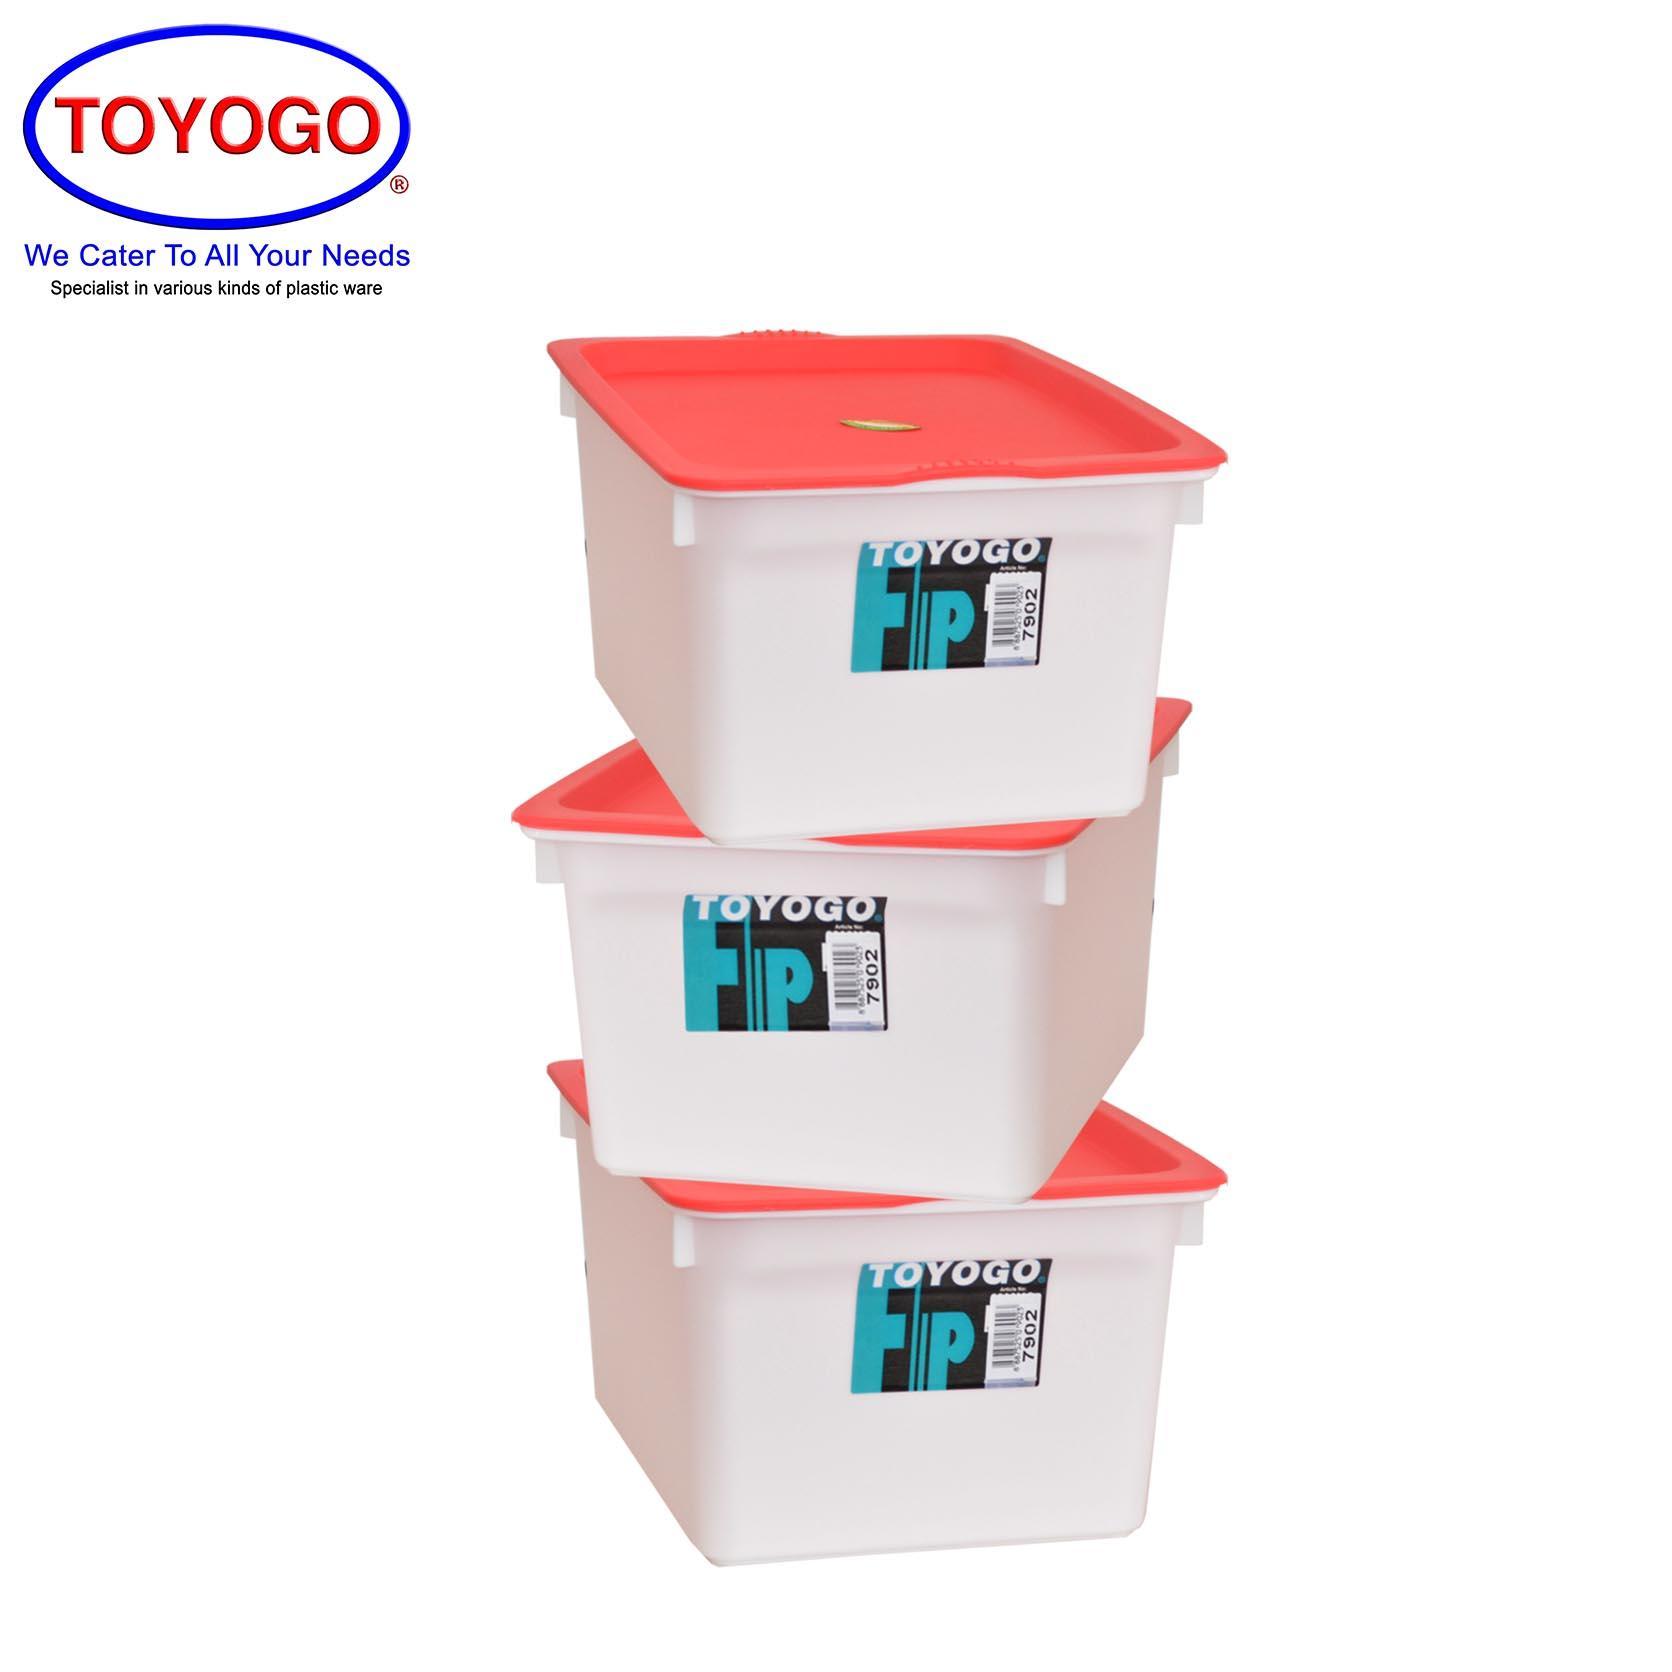 Toyogo Fancy Container (Bundle of 3) (7902)